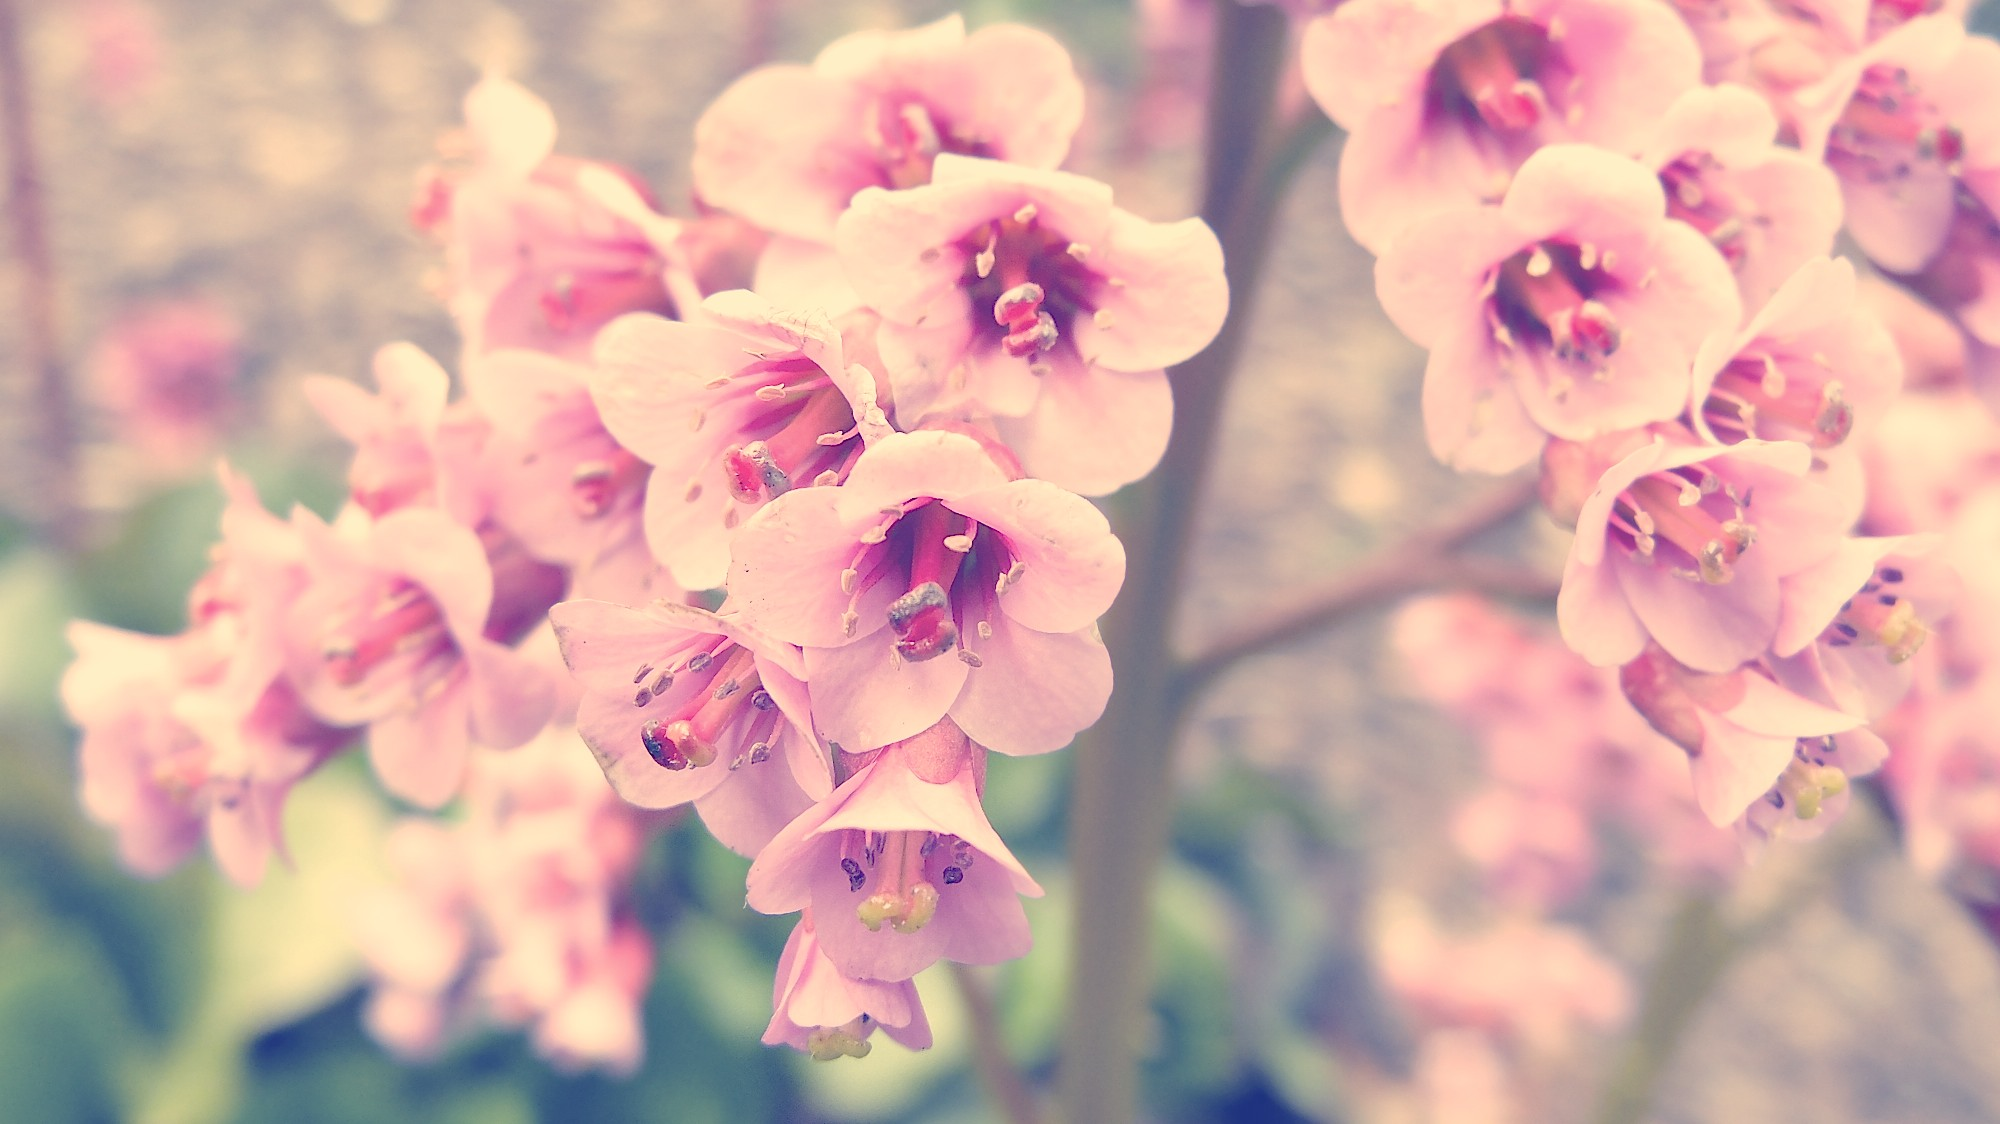 Vintage Flower Photography Backgrounds Untitled By Mouseleaf Dnjk